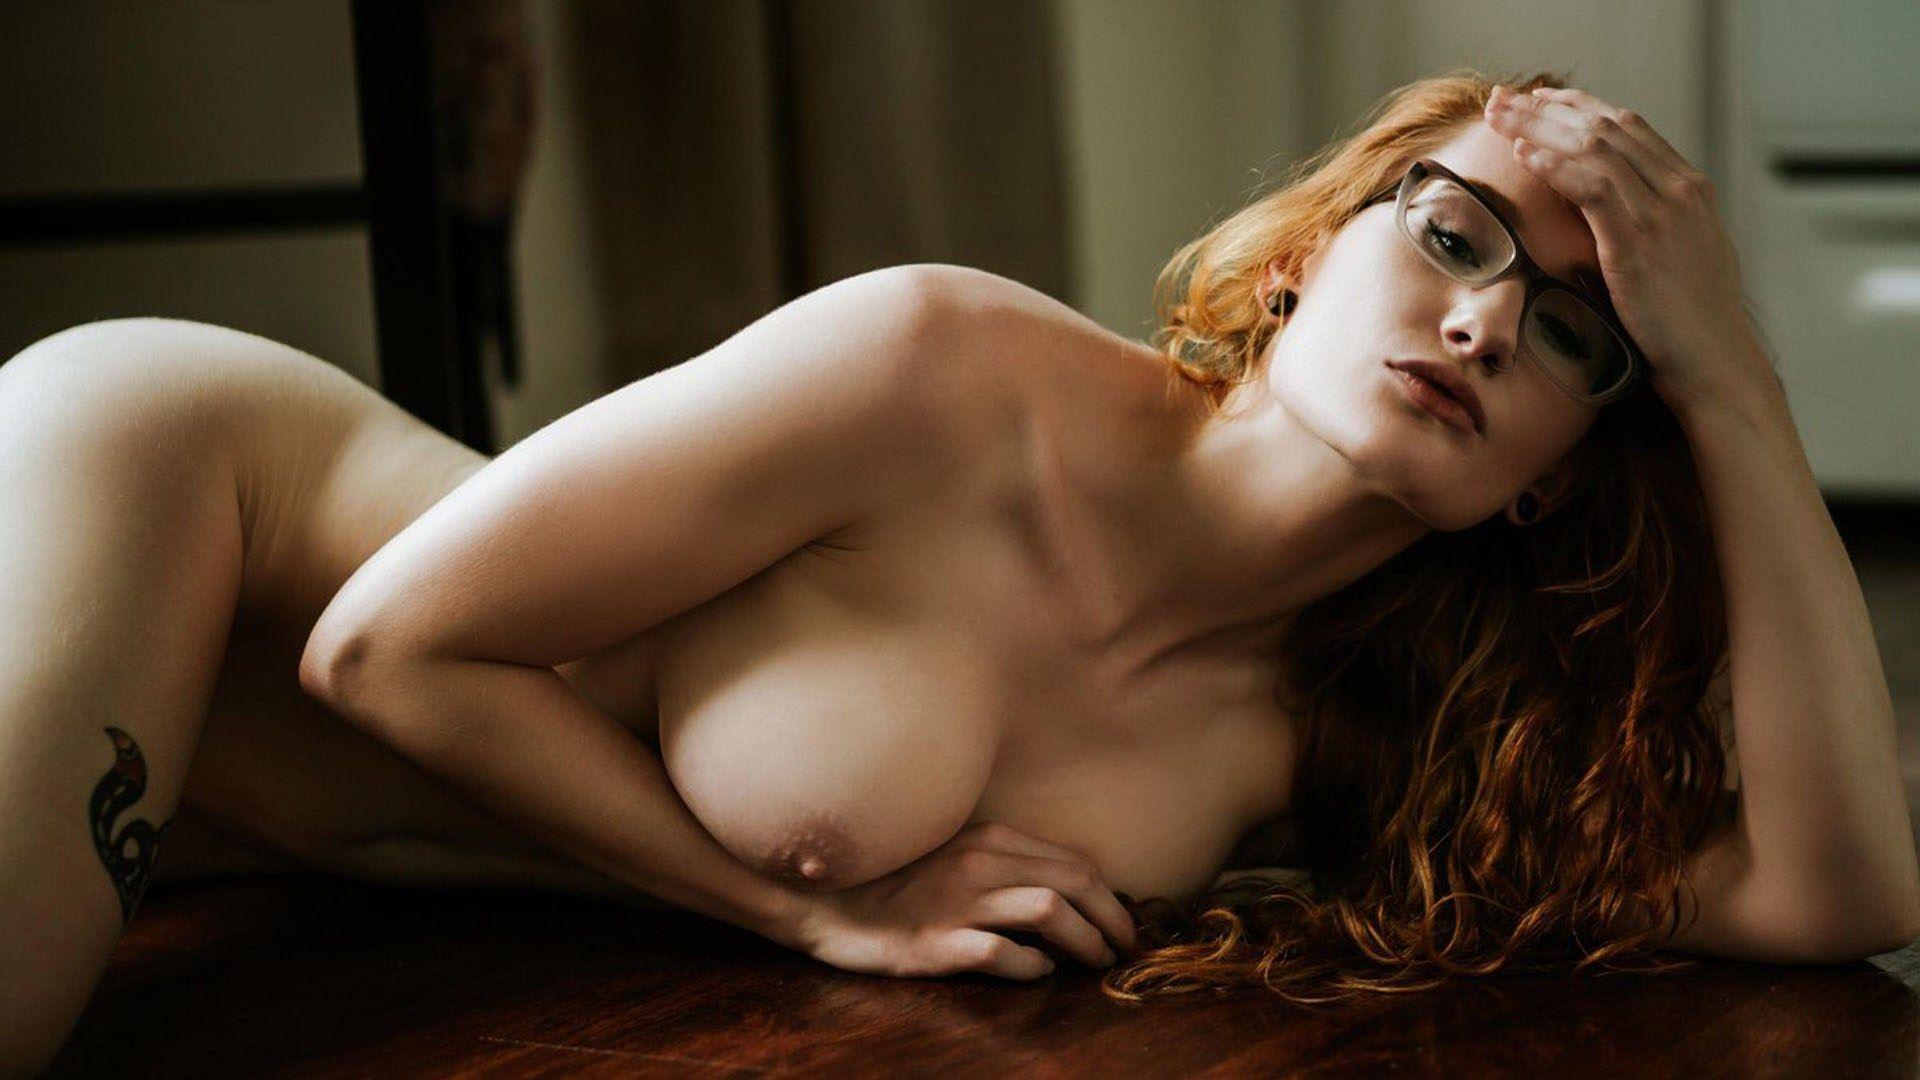 Free catagory interracial erotic story